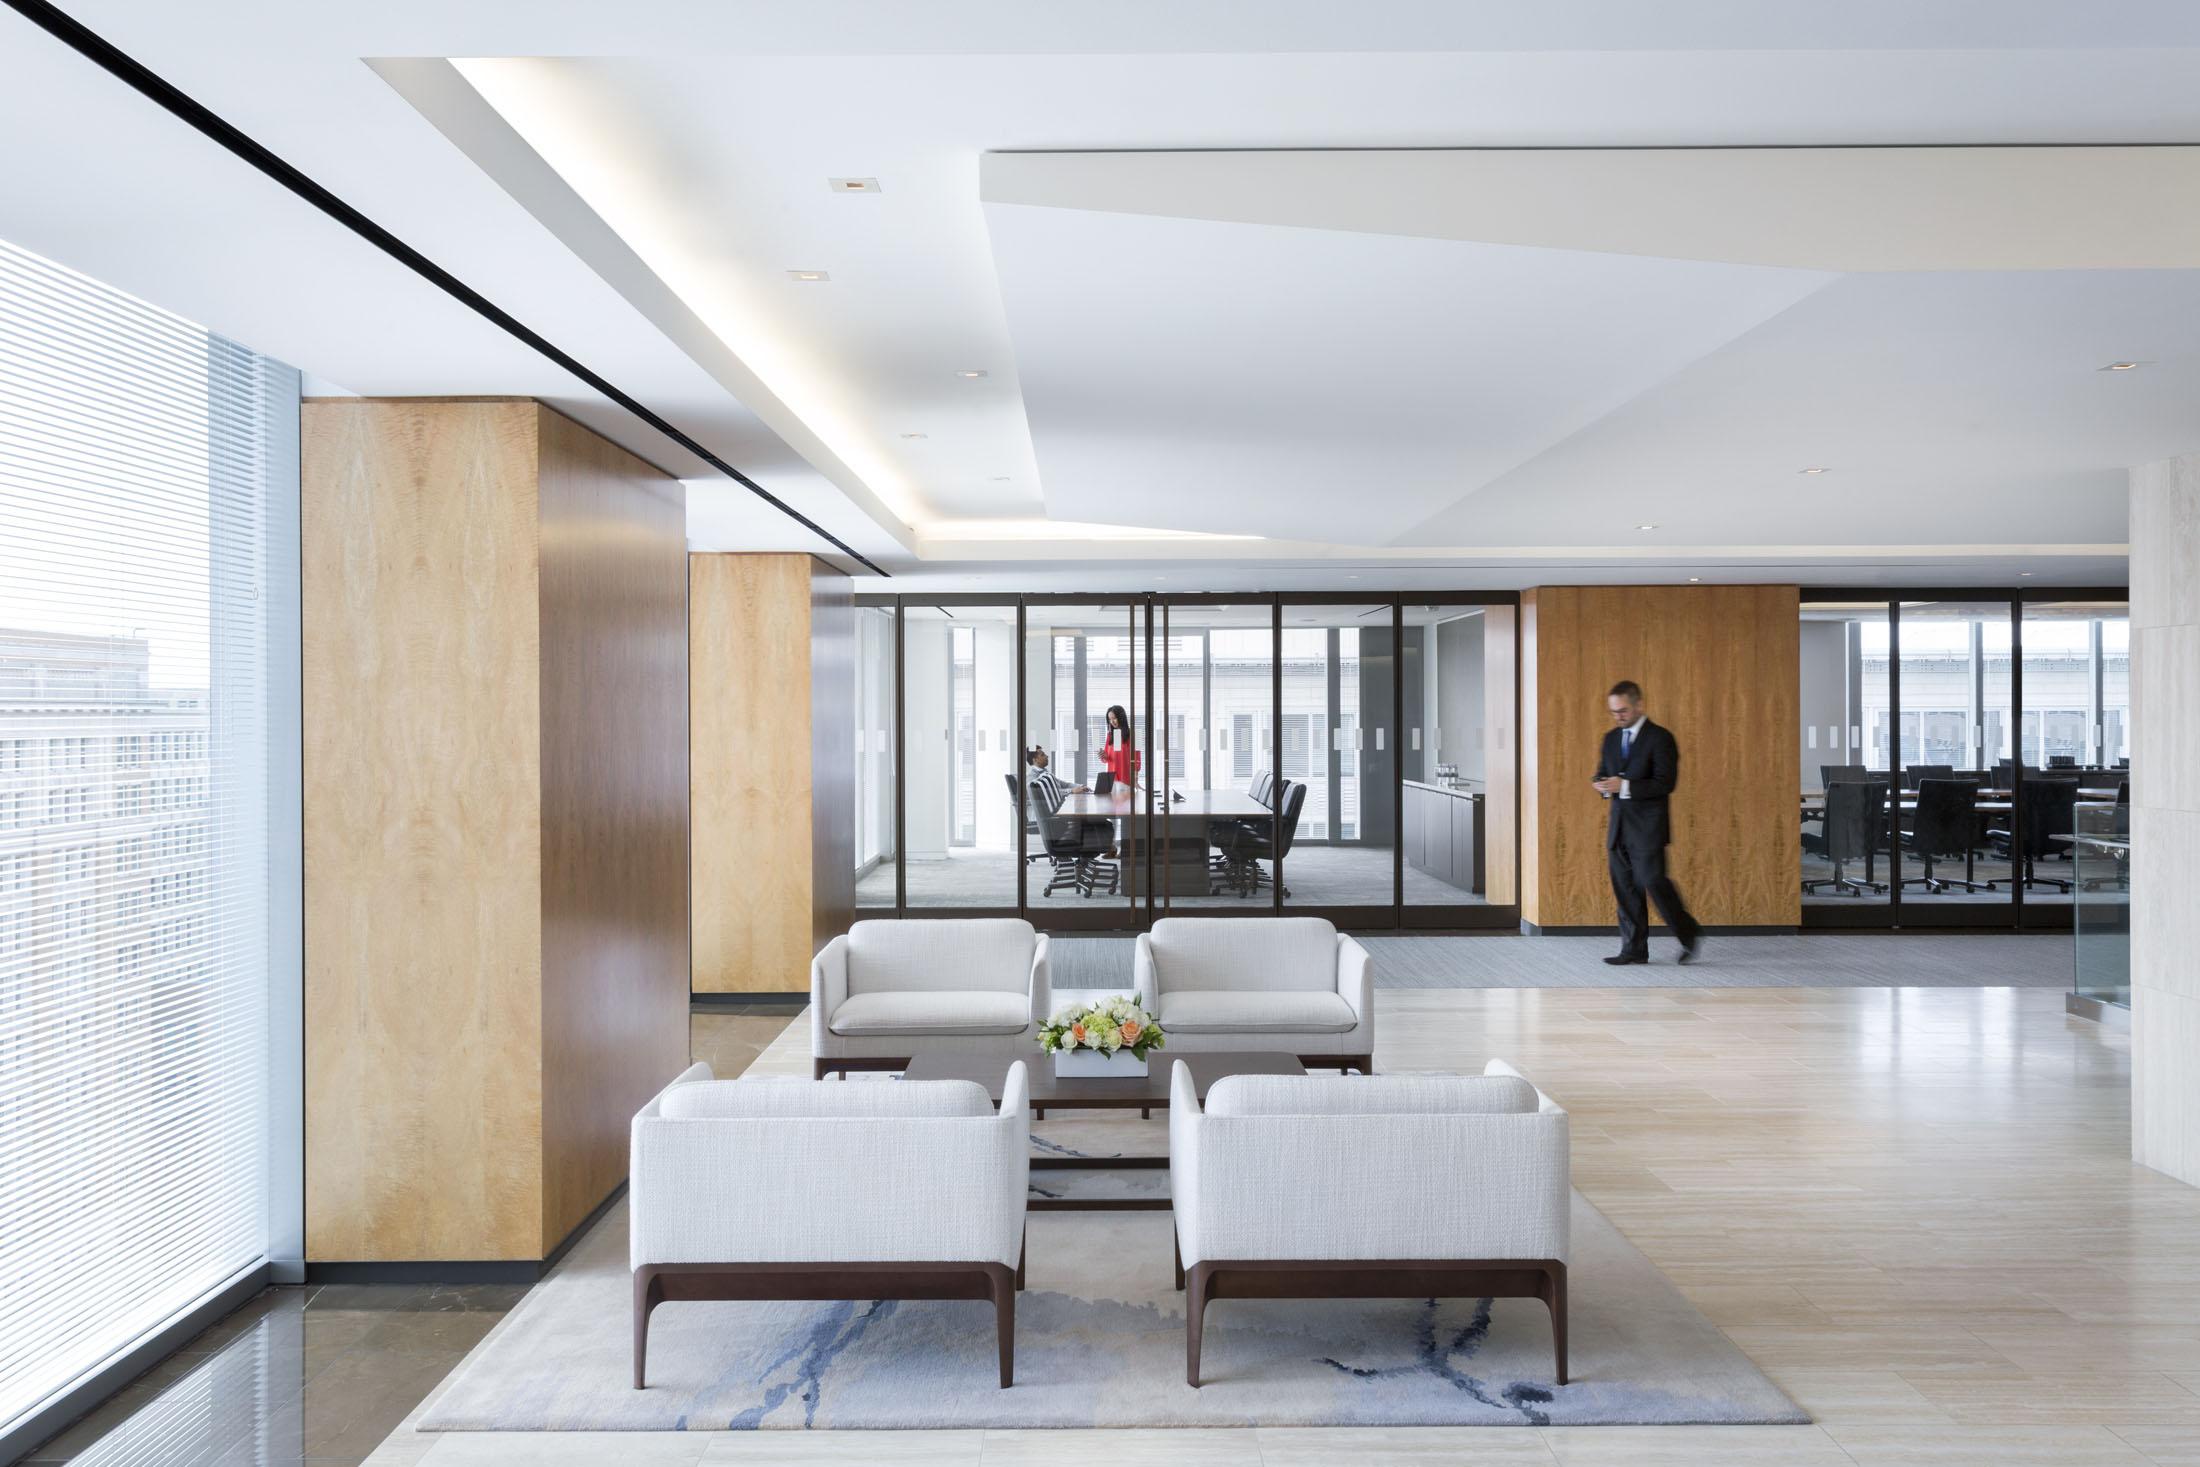 Brownstein Hyatt Office  Washington DC  Perkins+Will   View Full Project